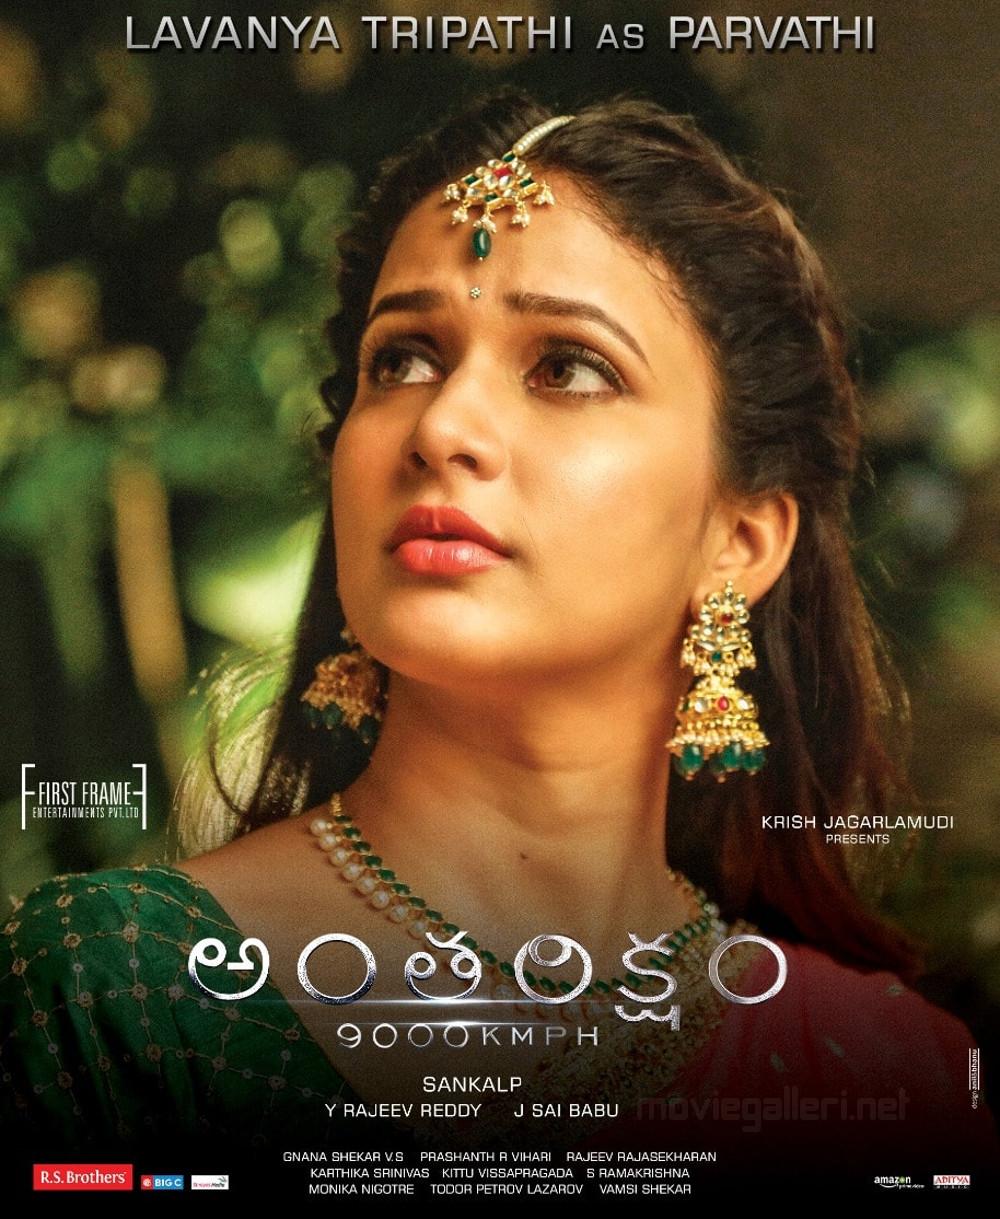 Actress Lavanya Tripathi as Parvathi in Antariksham 9000 KMPH Movie Poster HD